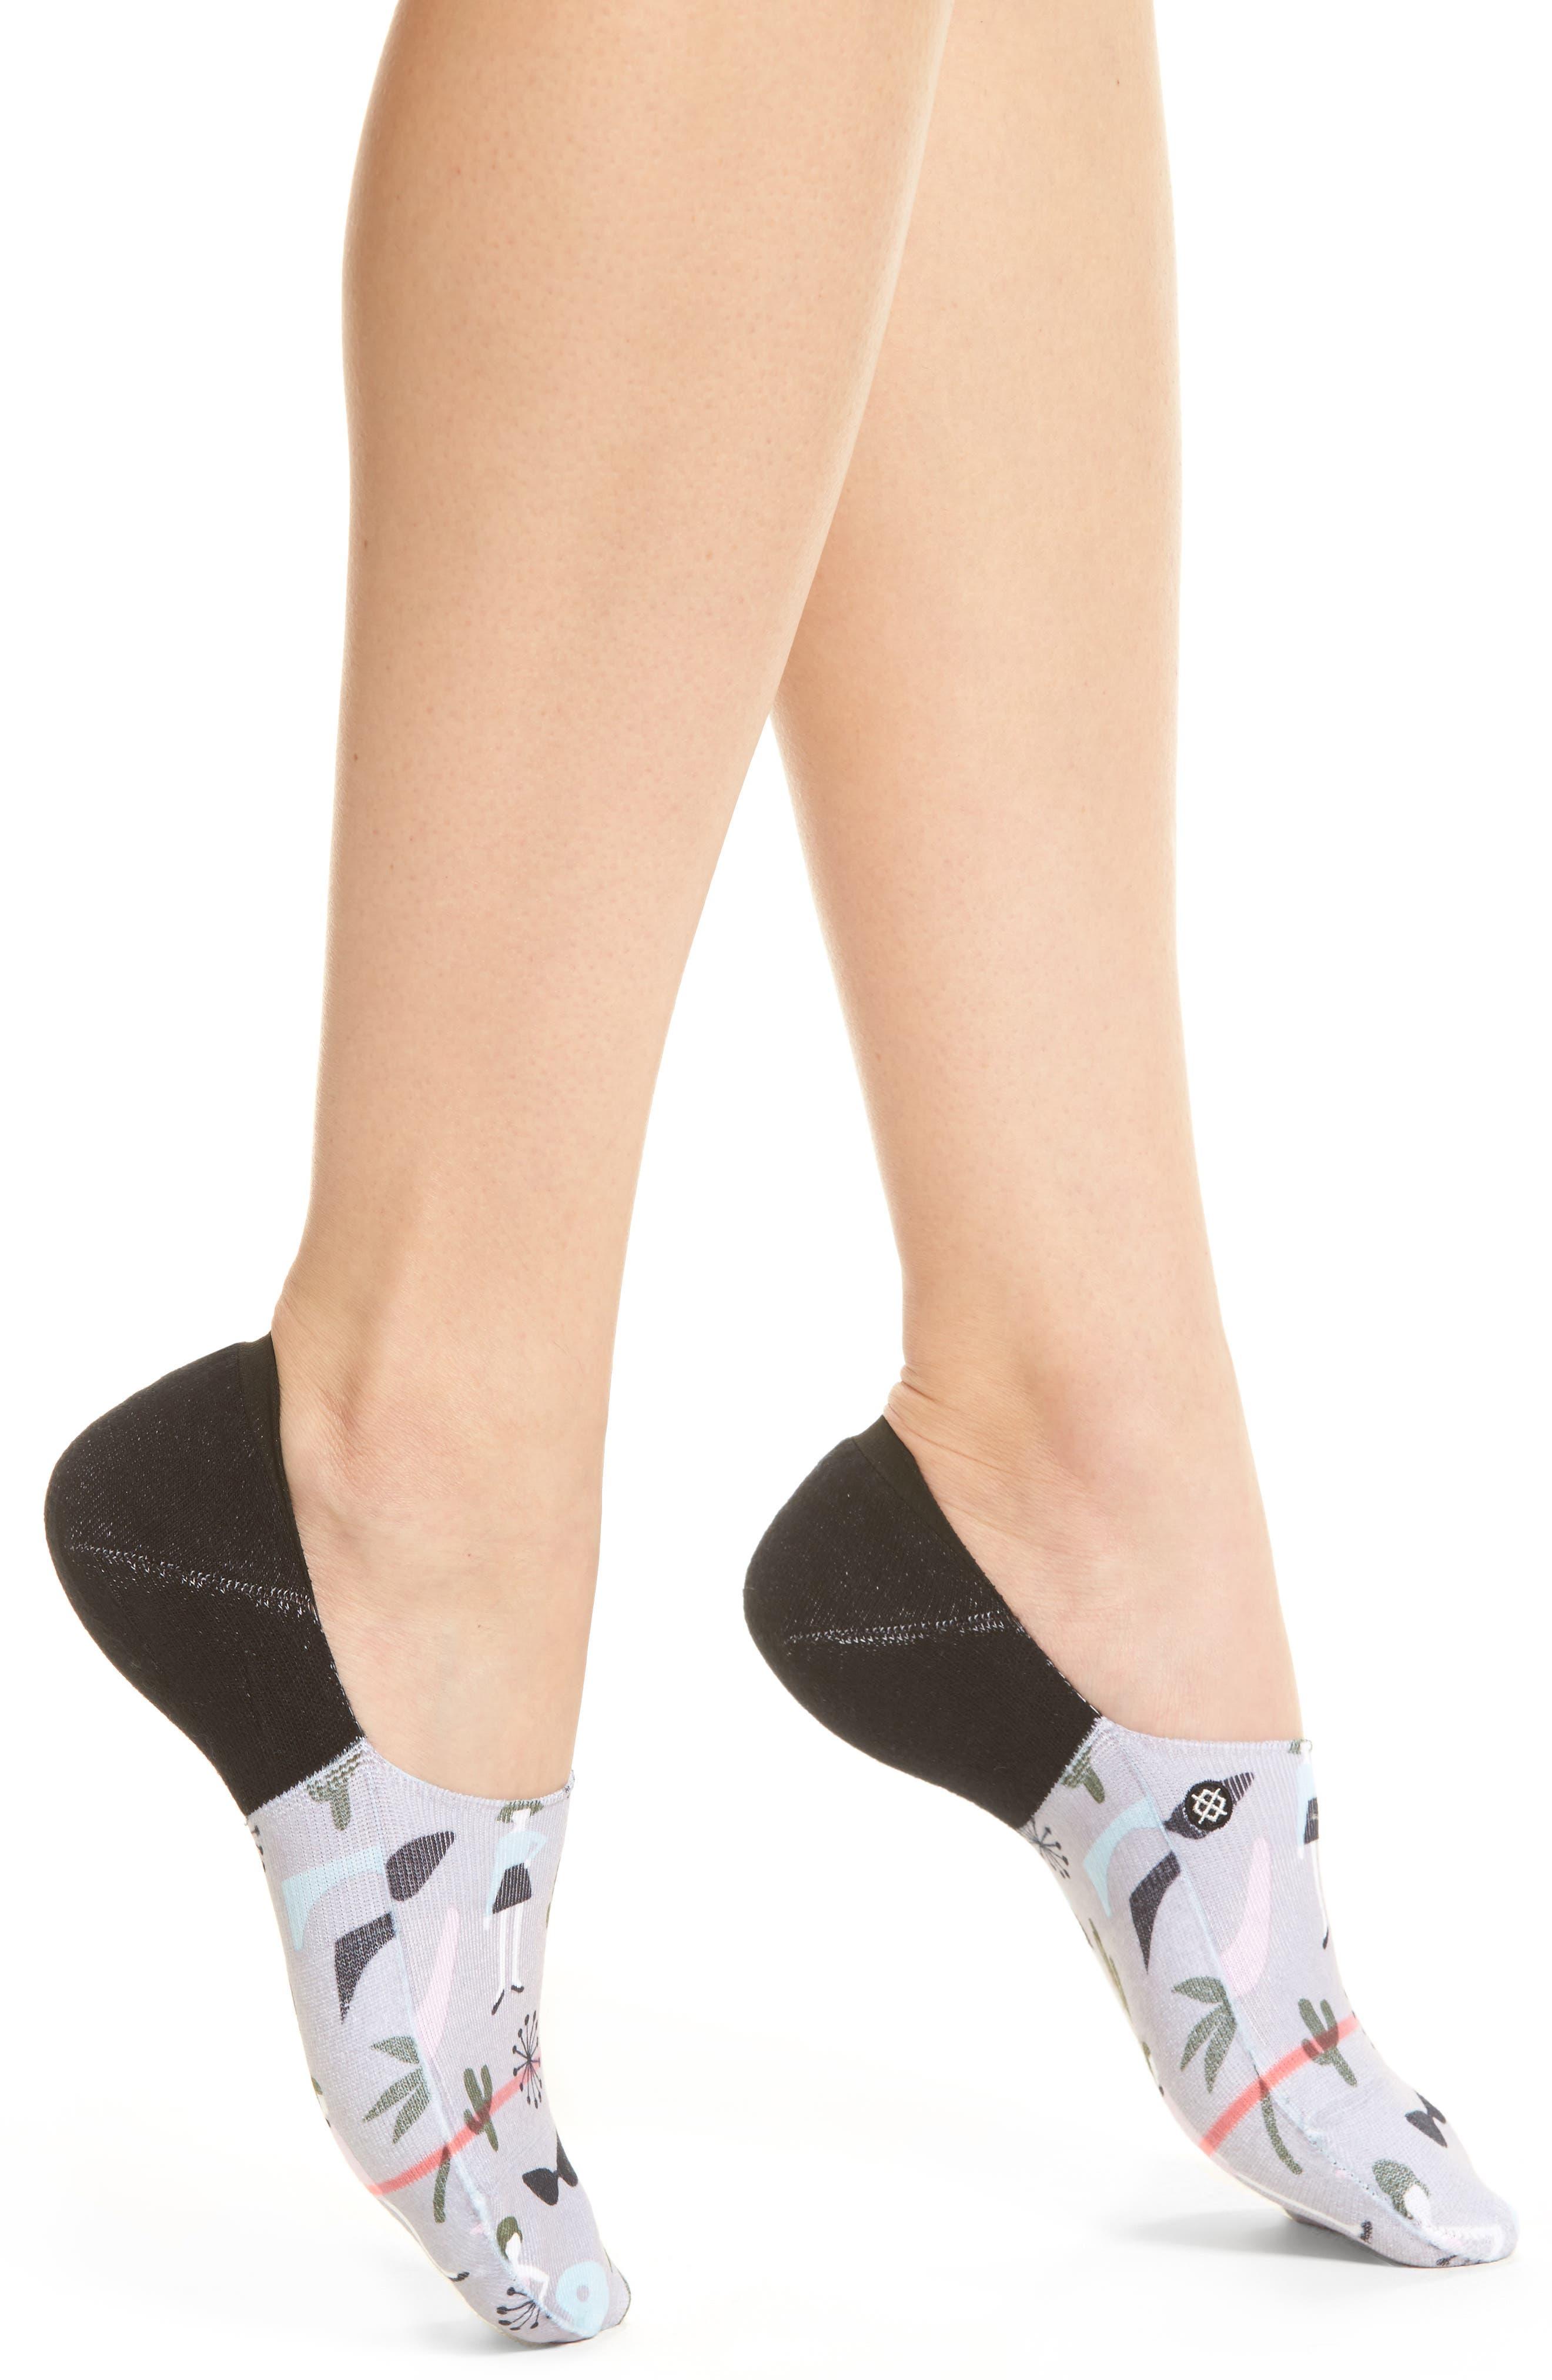 x Bijou Going Steady Super Invisible No-Show Socks,                             Main thumbnail 1, color,                             GREY